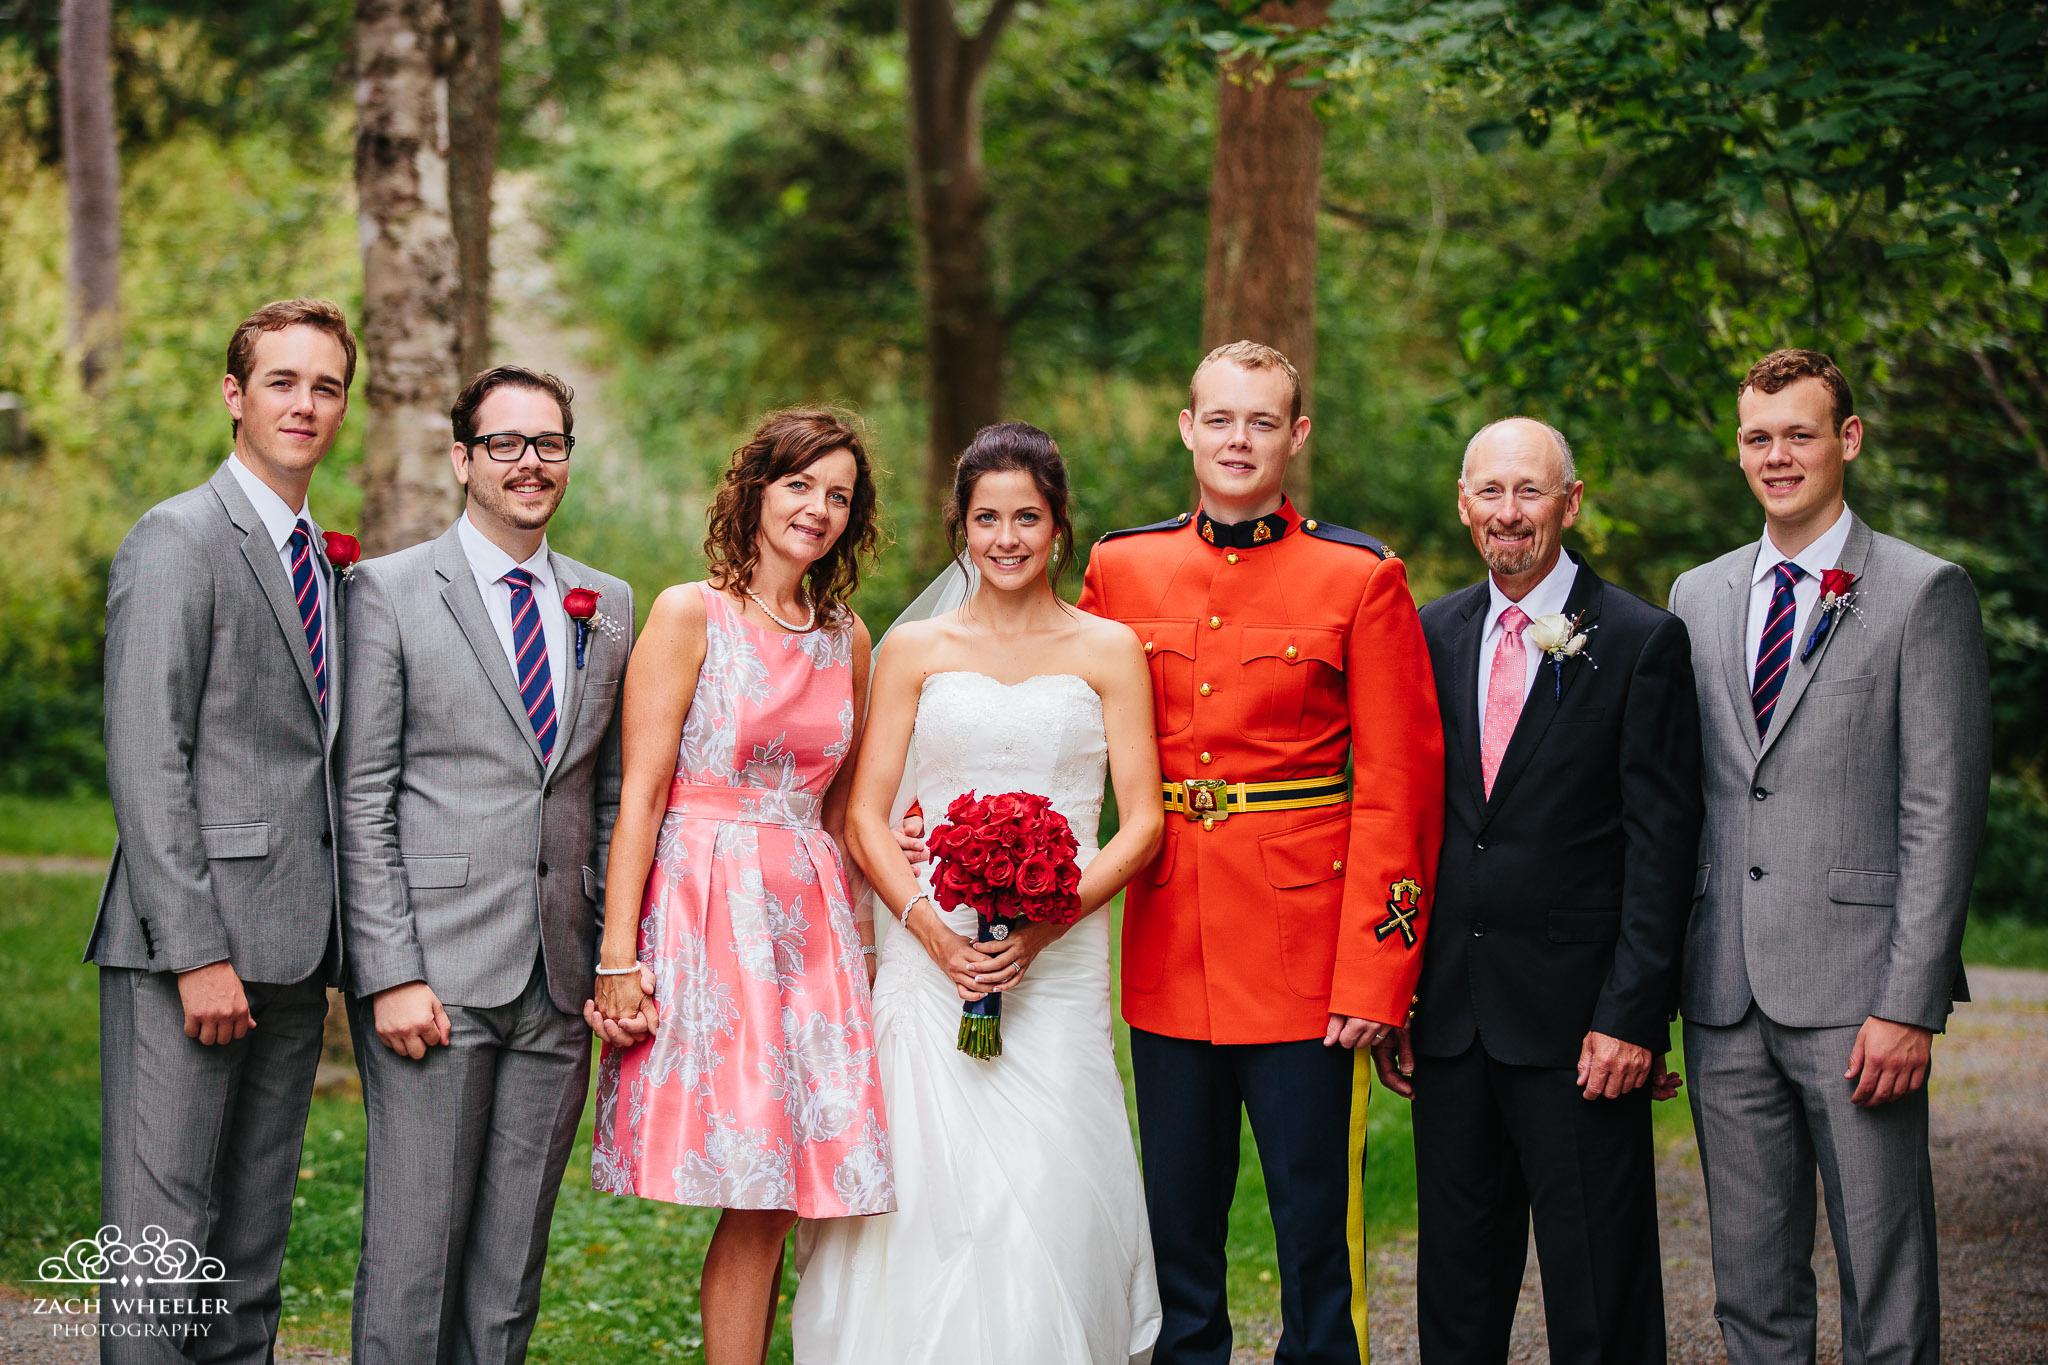 Laura-Benj-StJohns-Wedding-71